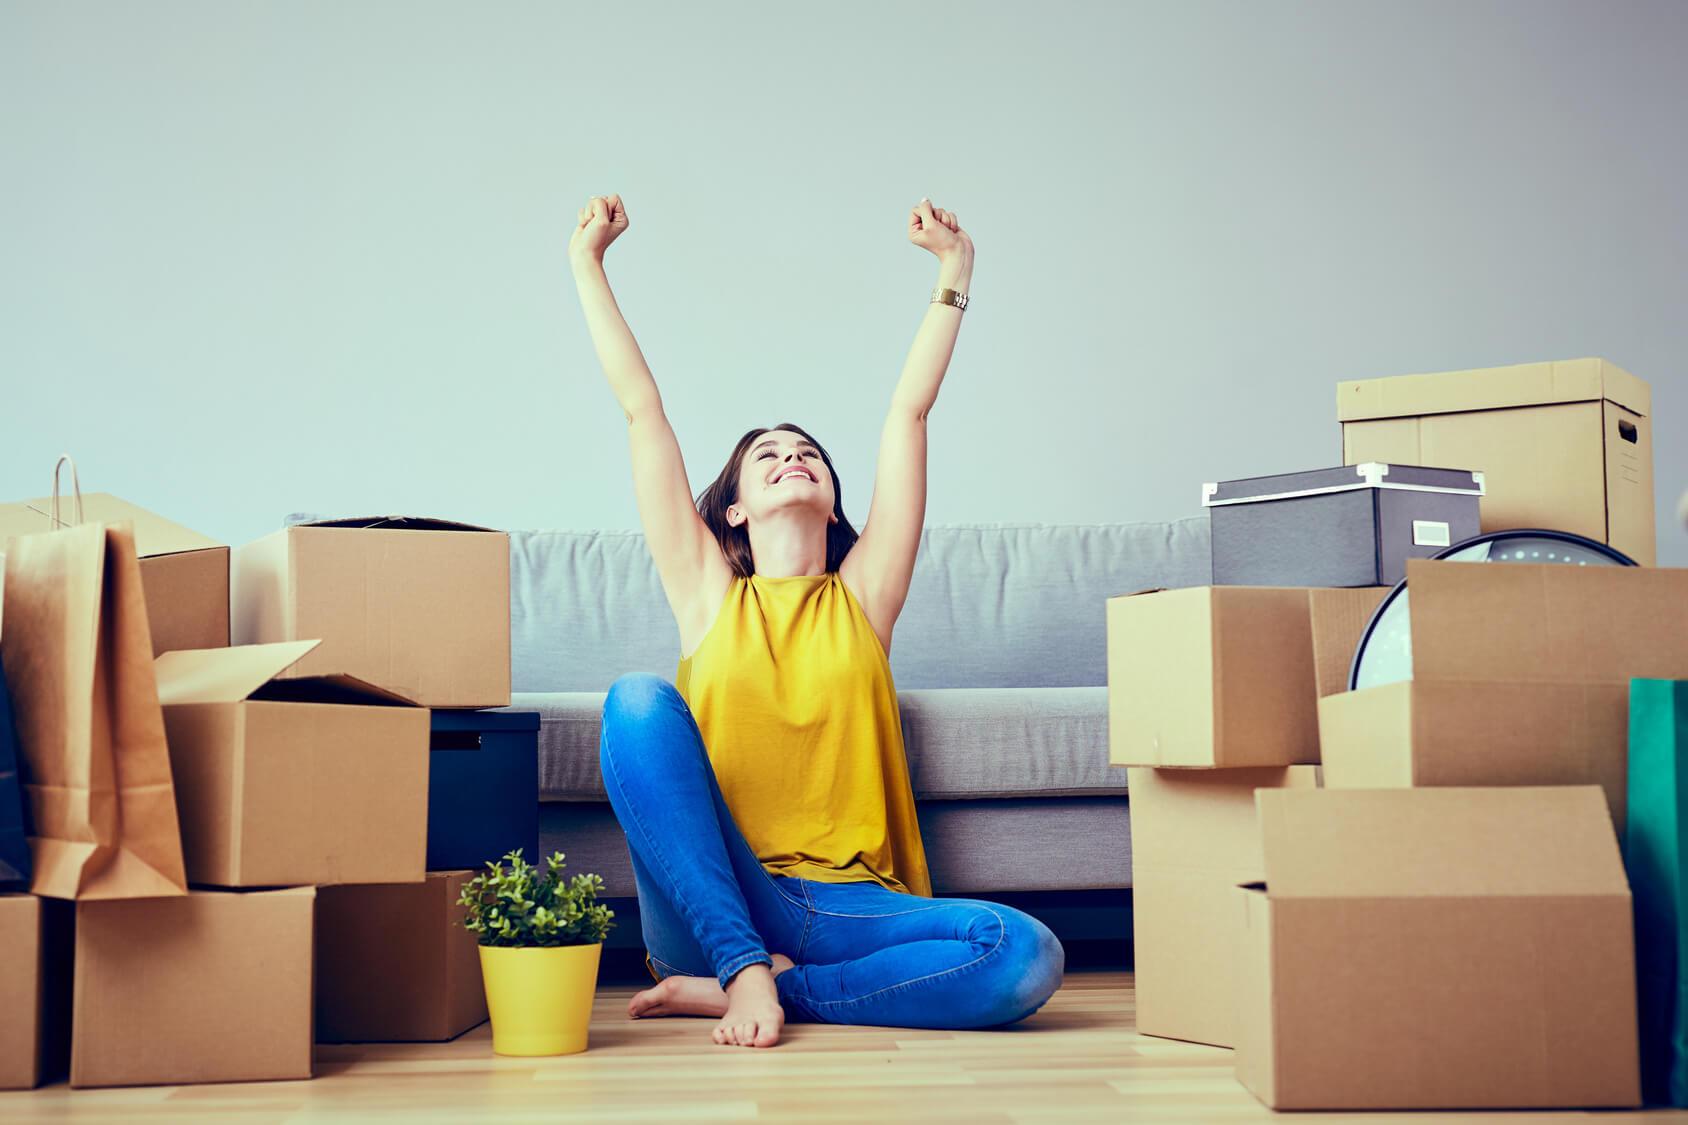 déménager sans stress